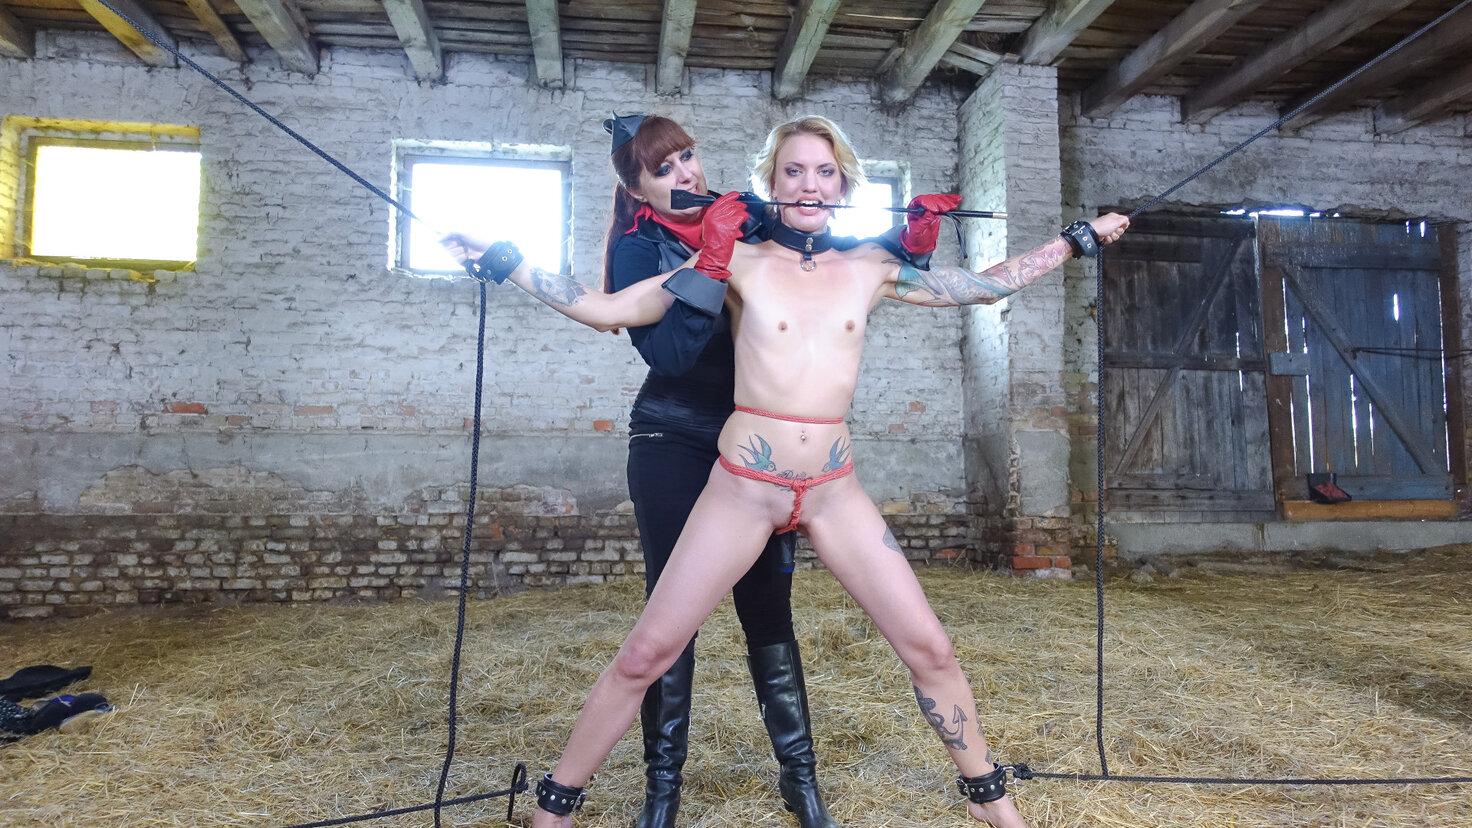 Femdoms Lullu Gun and Lady Cosima torture and dominate German feet slaves